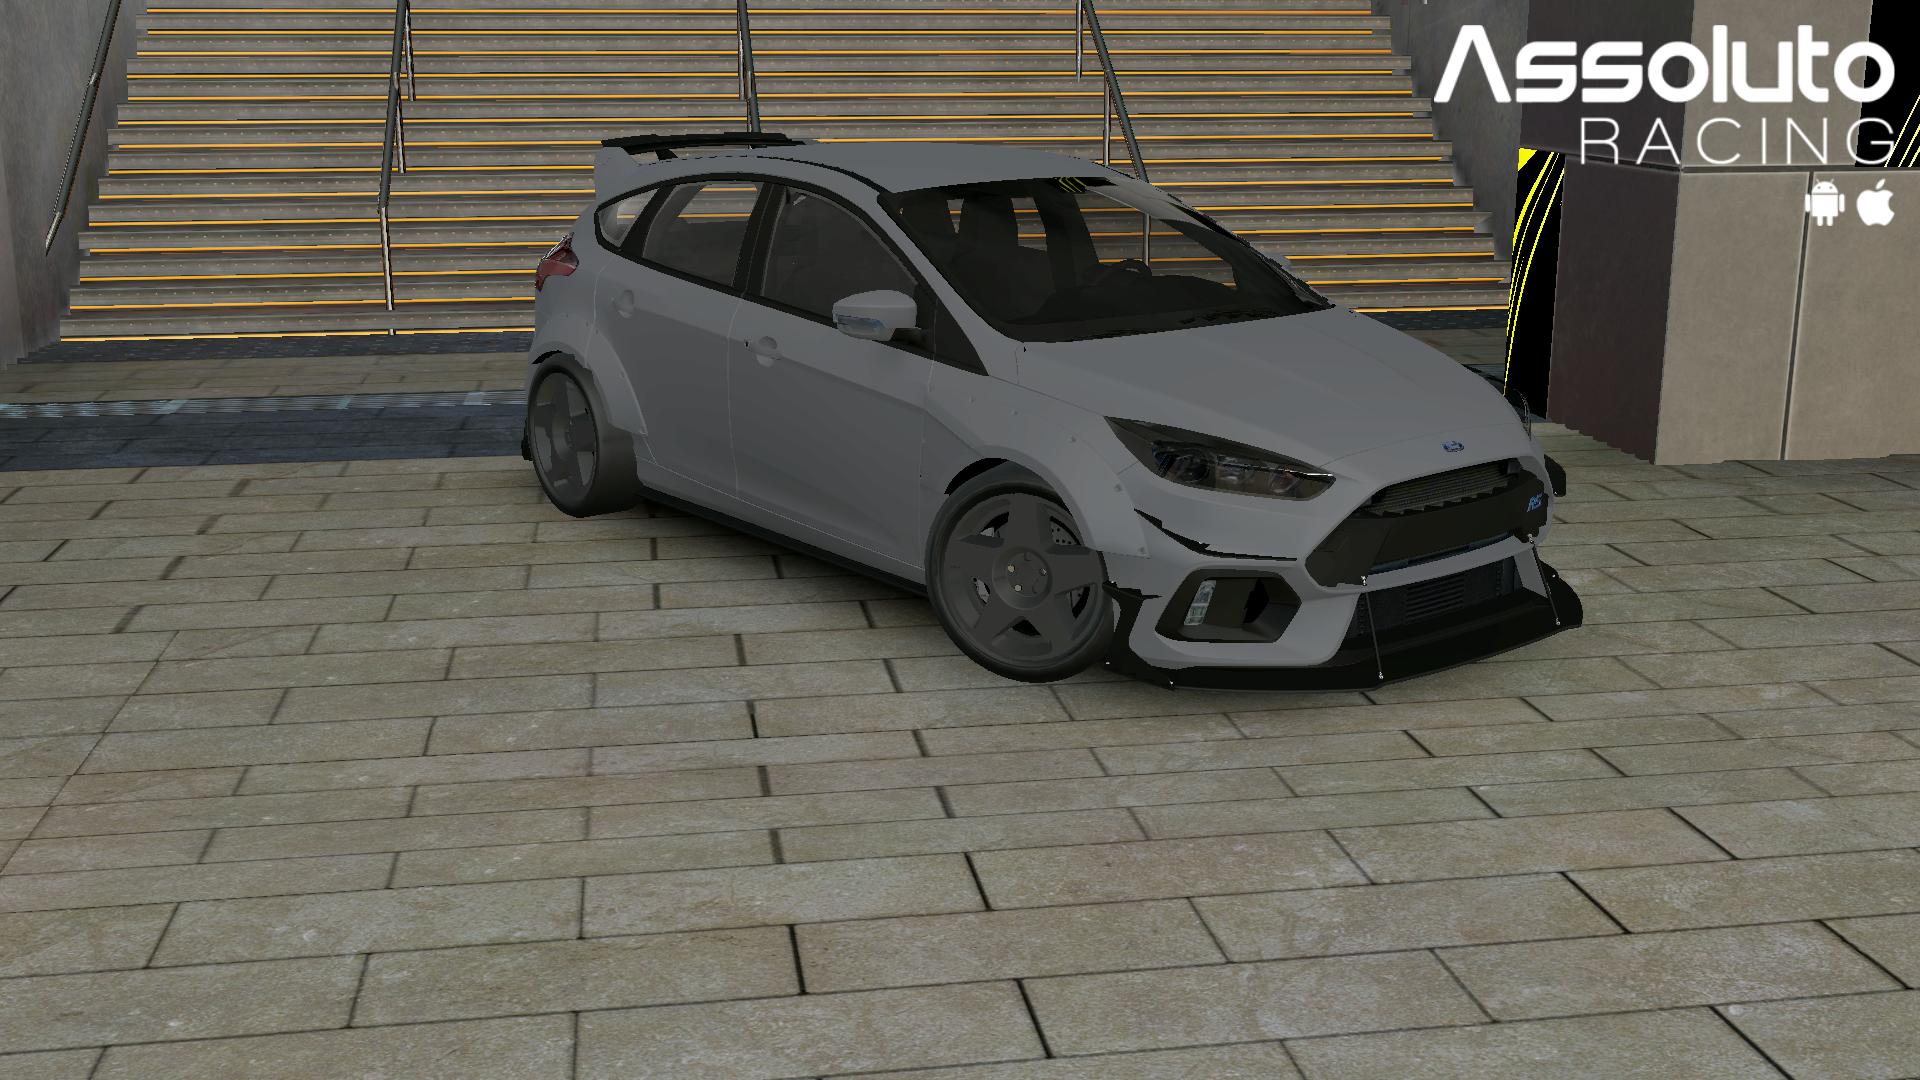 Assoluto Racing Pic 2